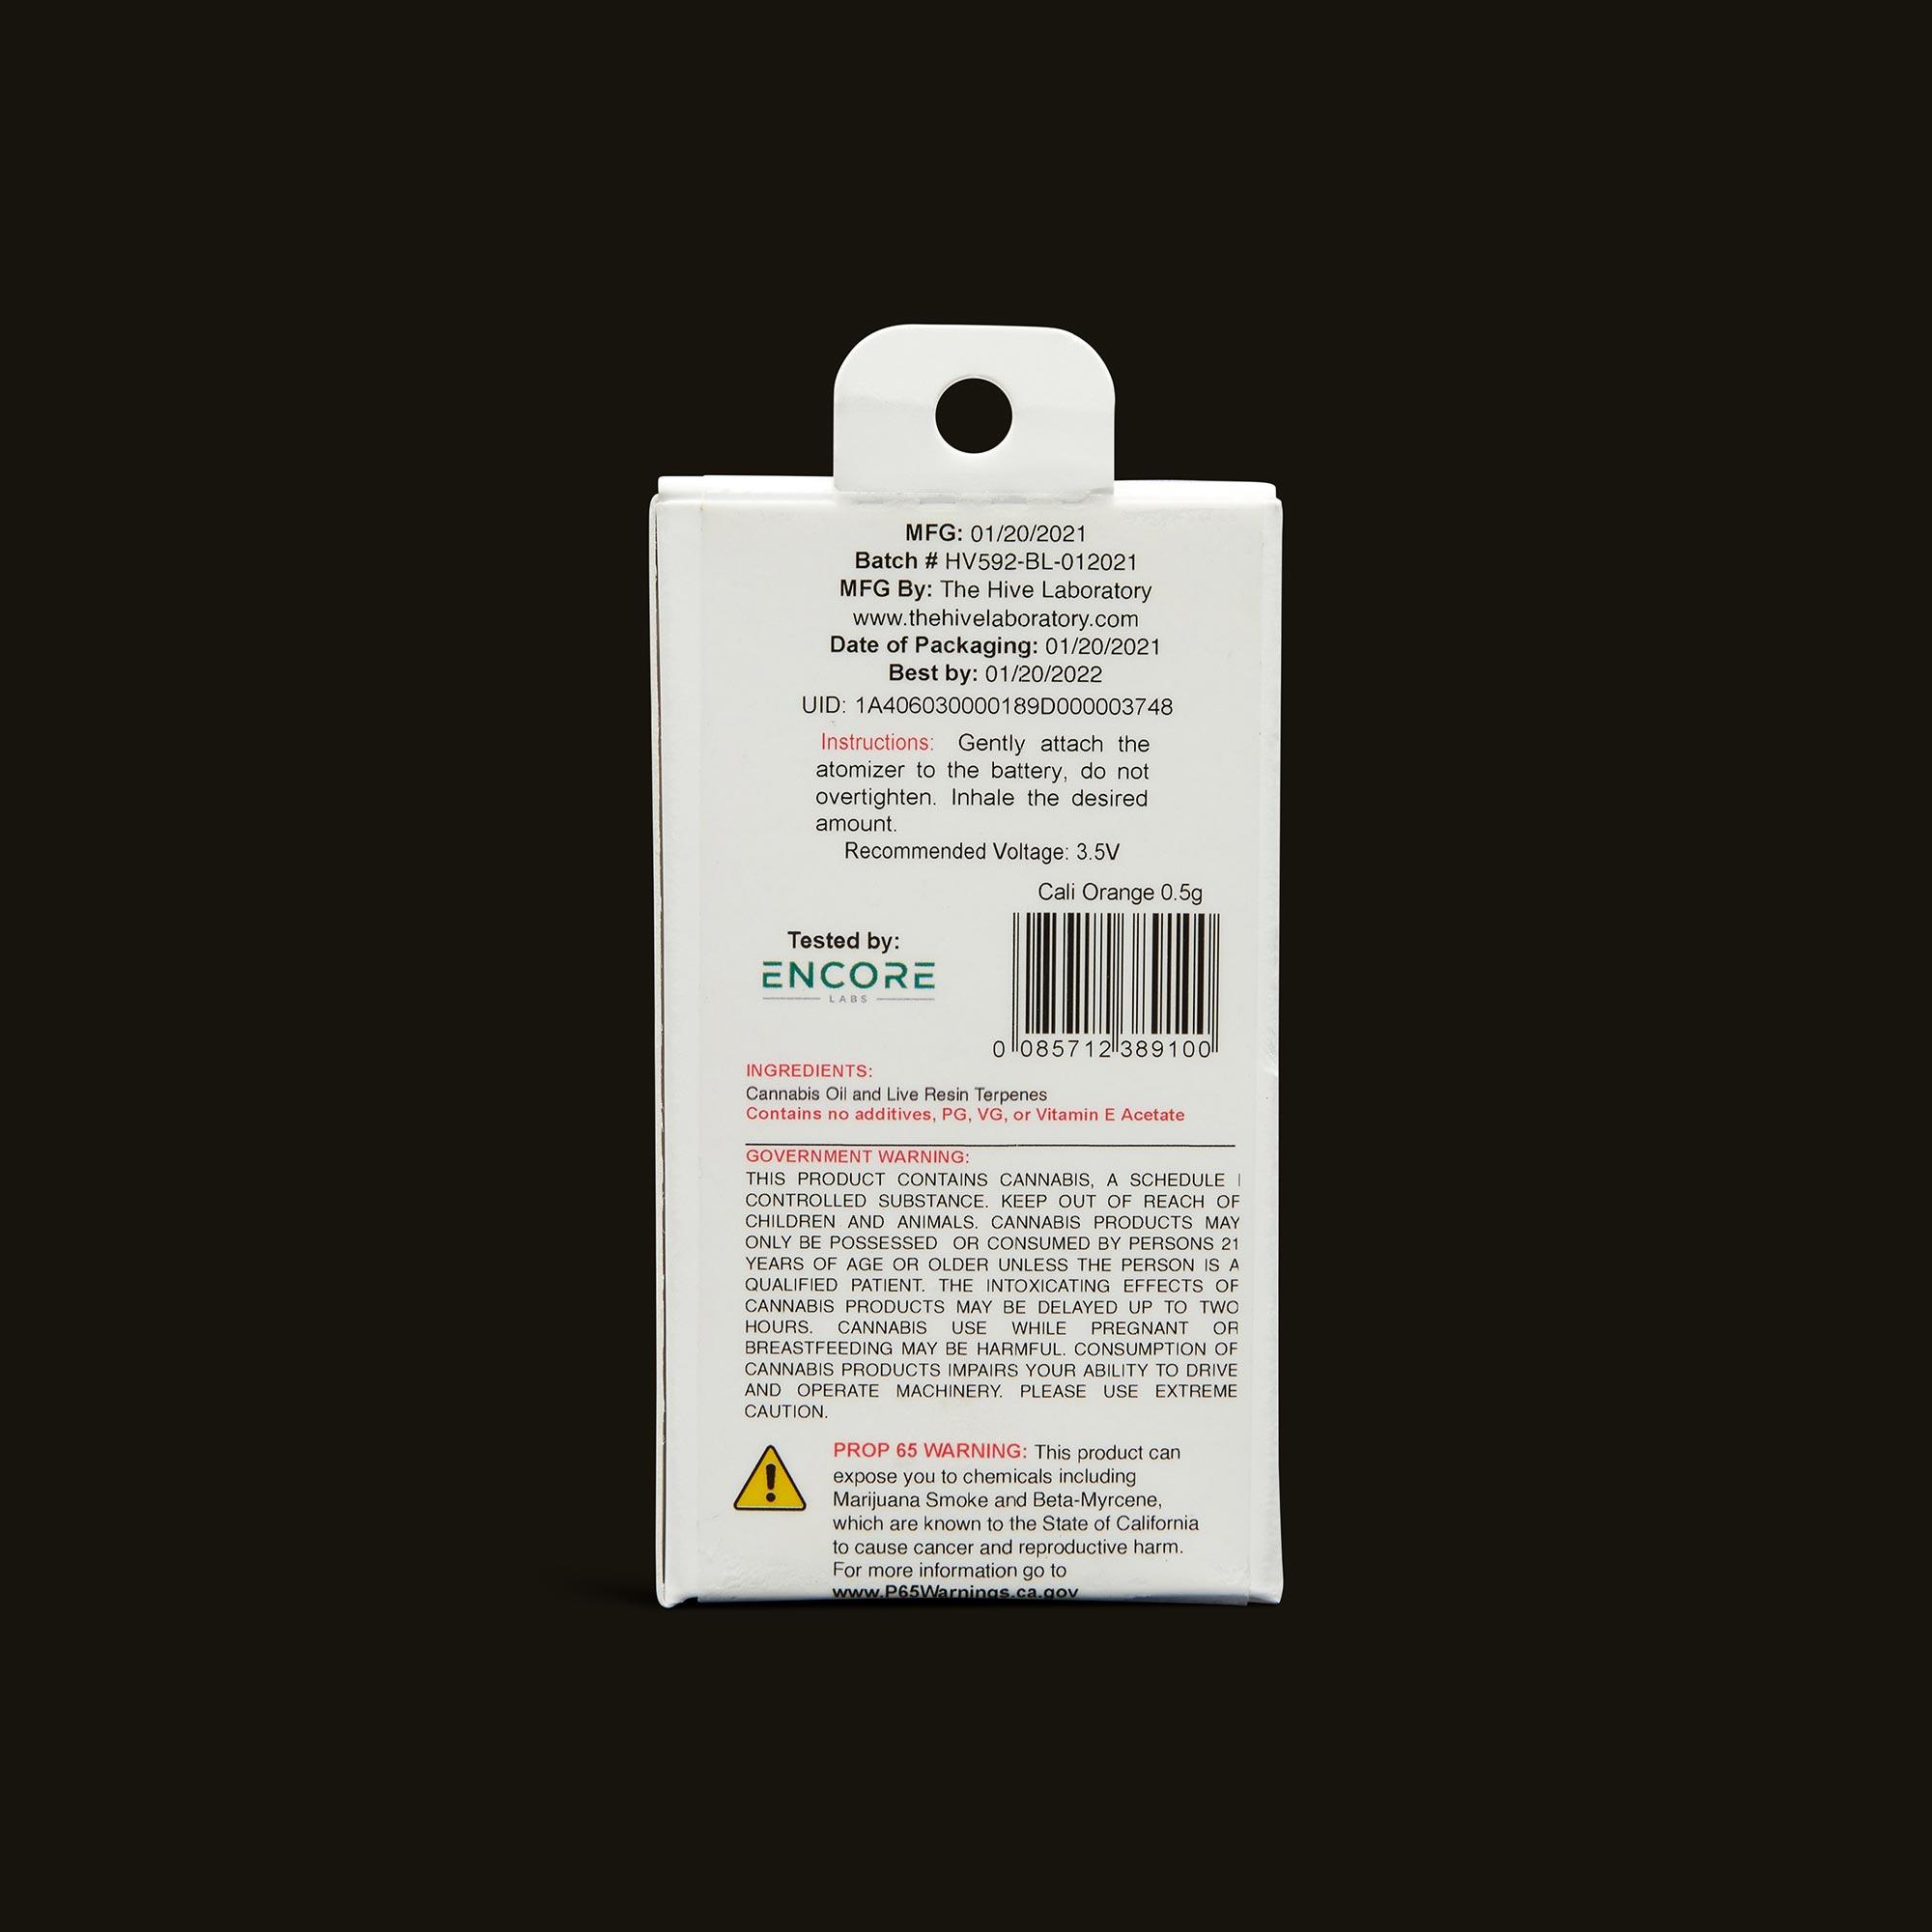 Bloom Brands Vape Pen - Cali Orange Live Resin Cartridge - 1g